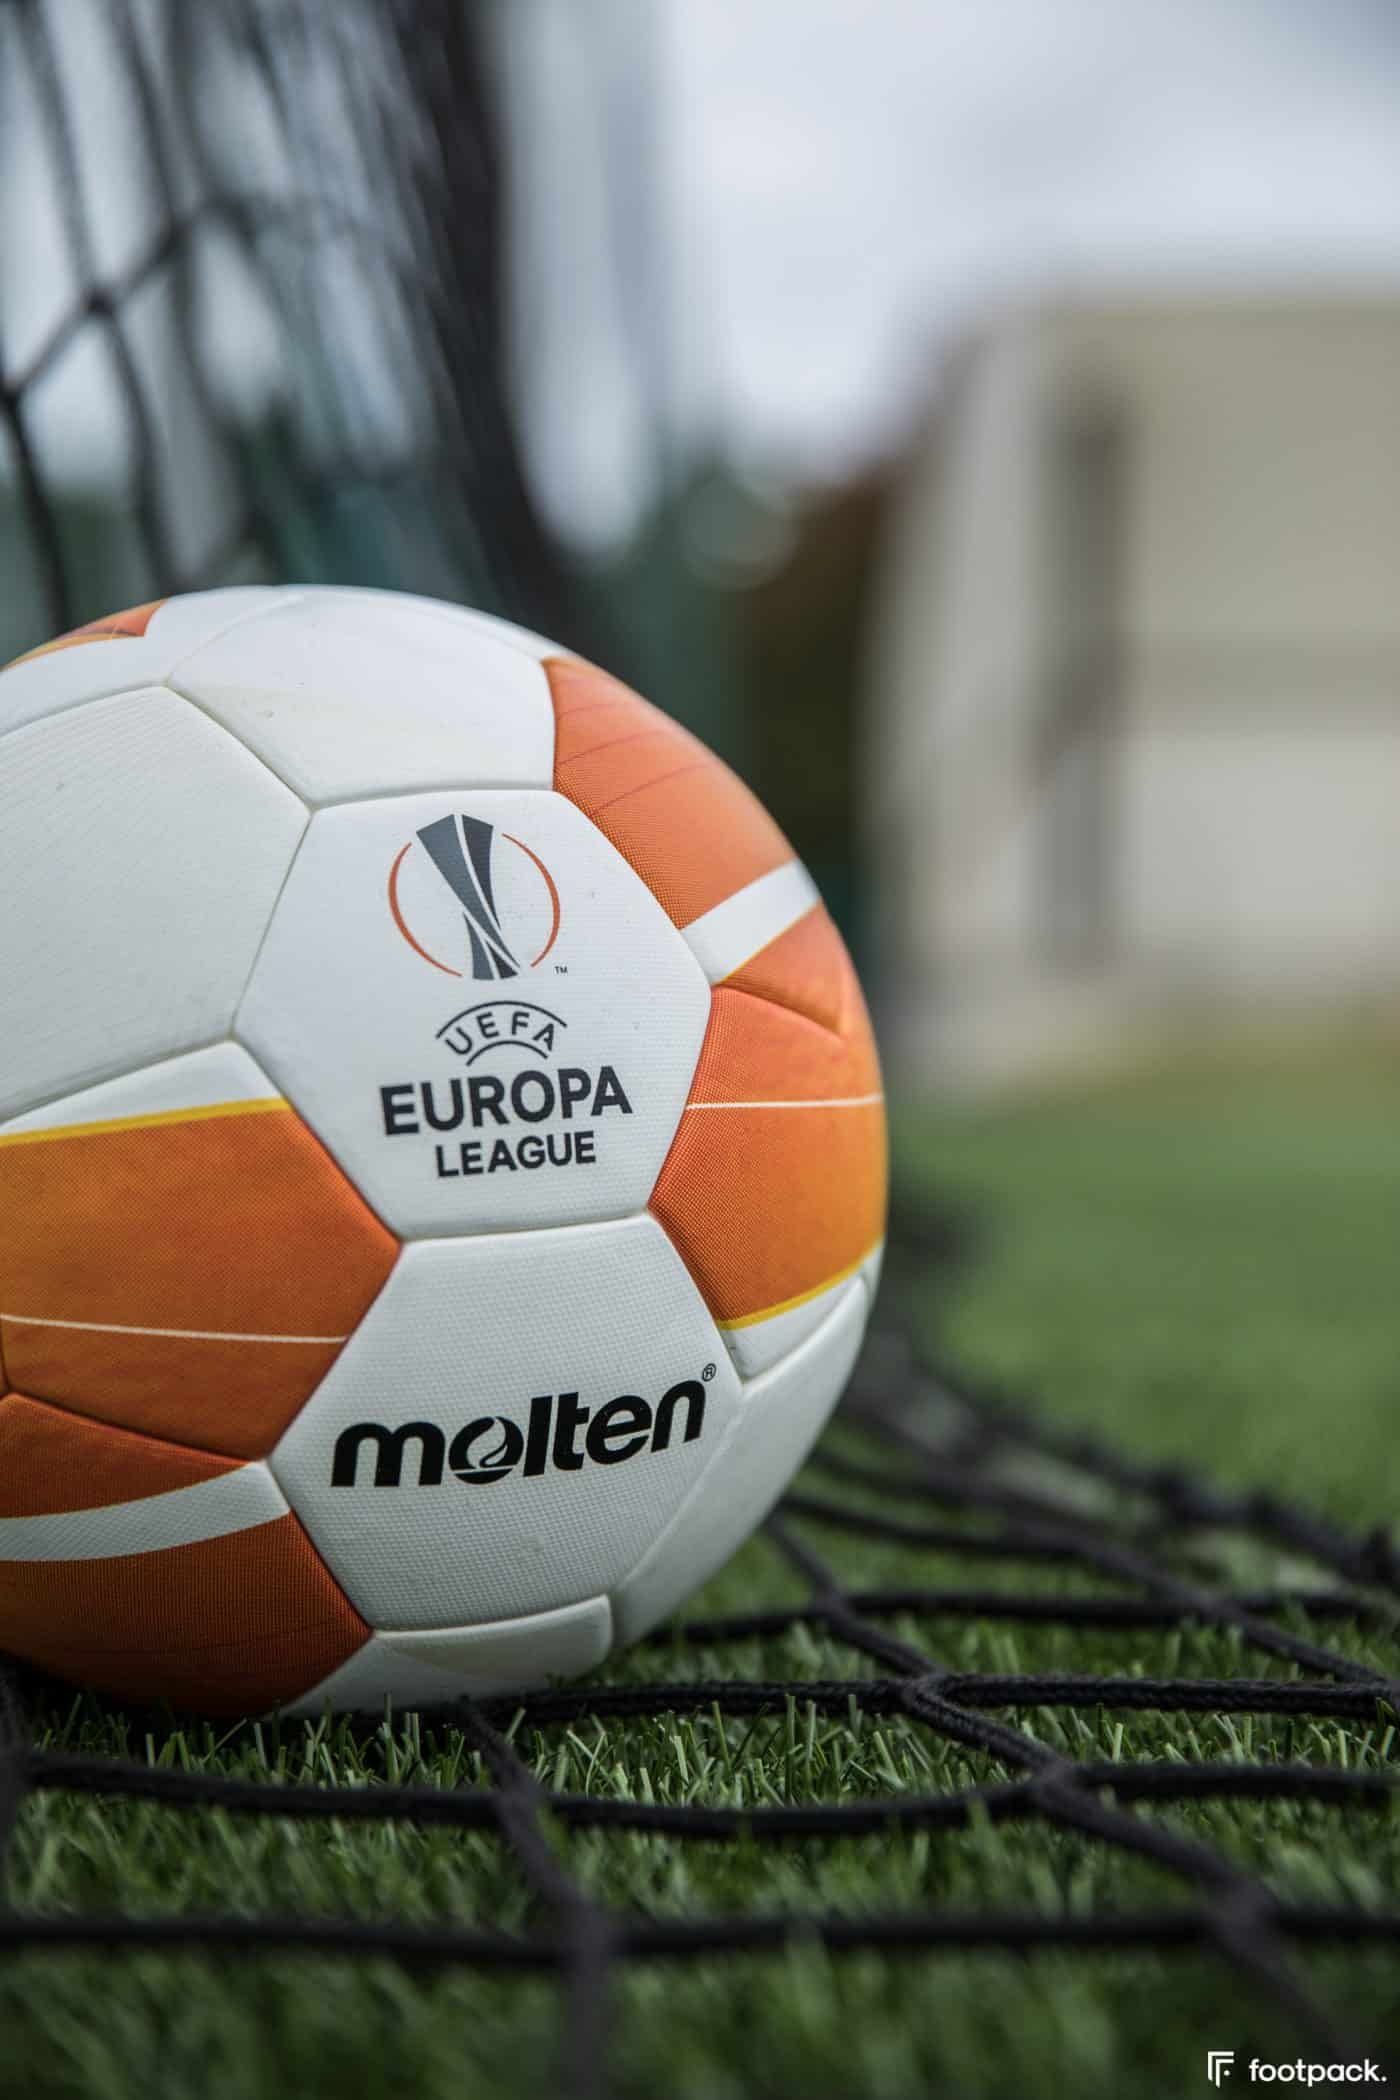 ballon-europa-league-2020-2021-footpack-2